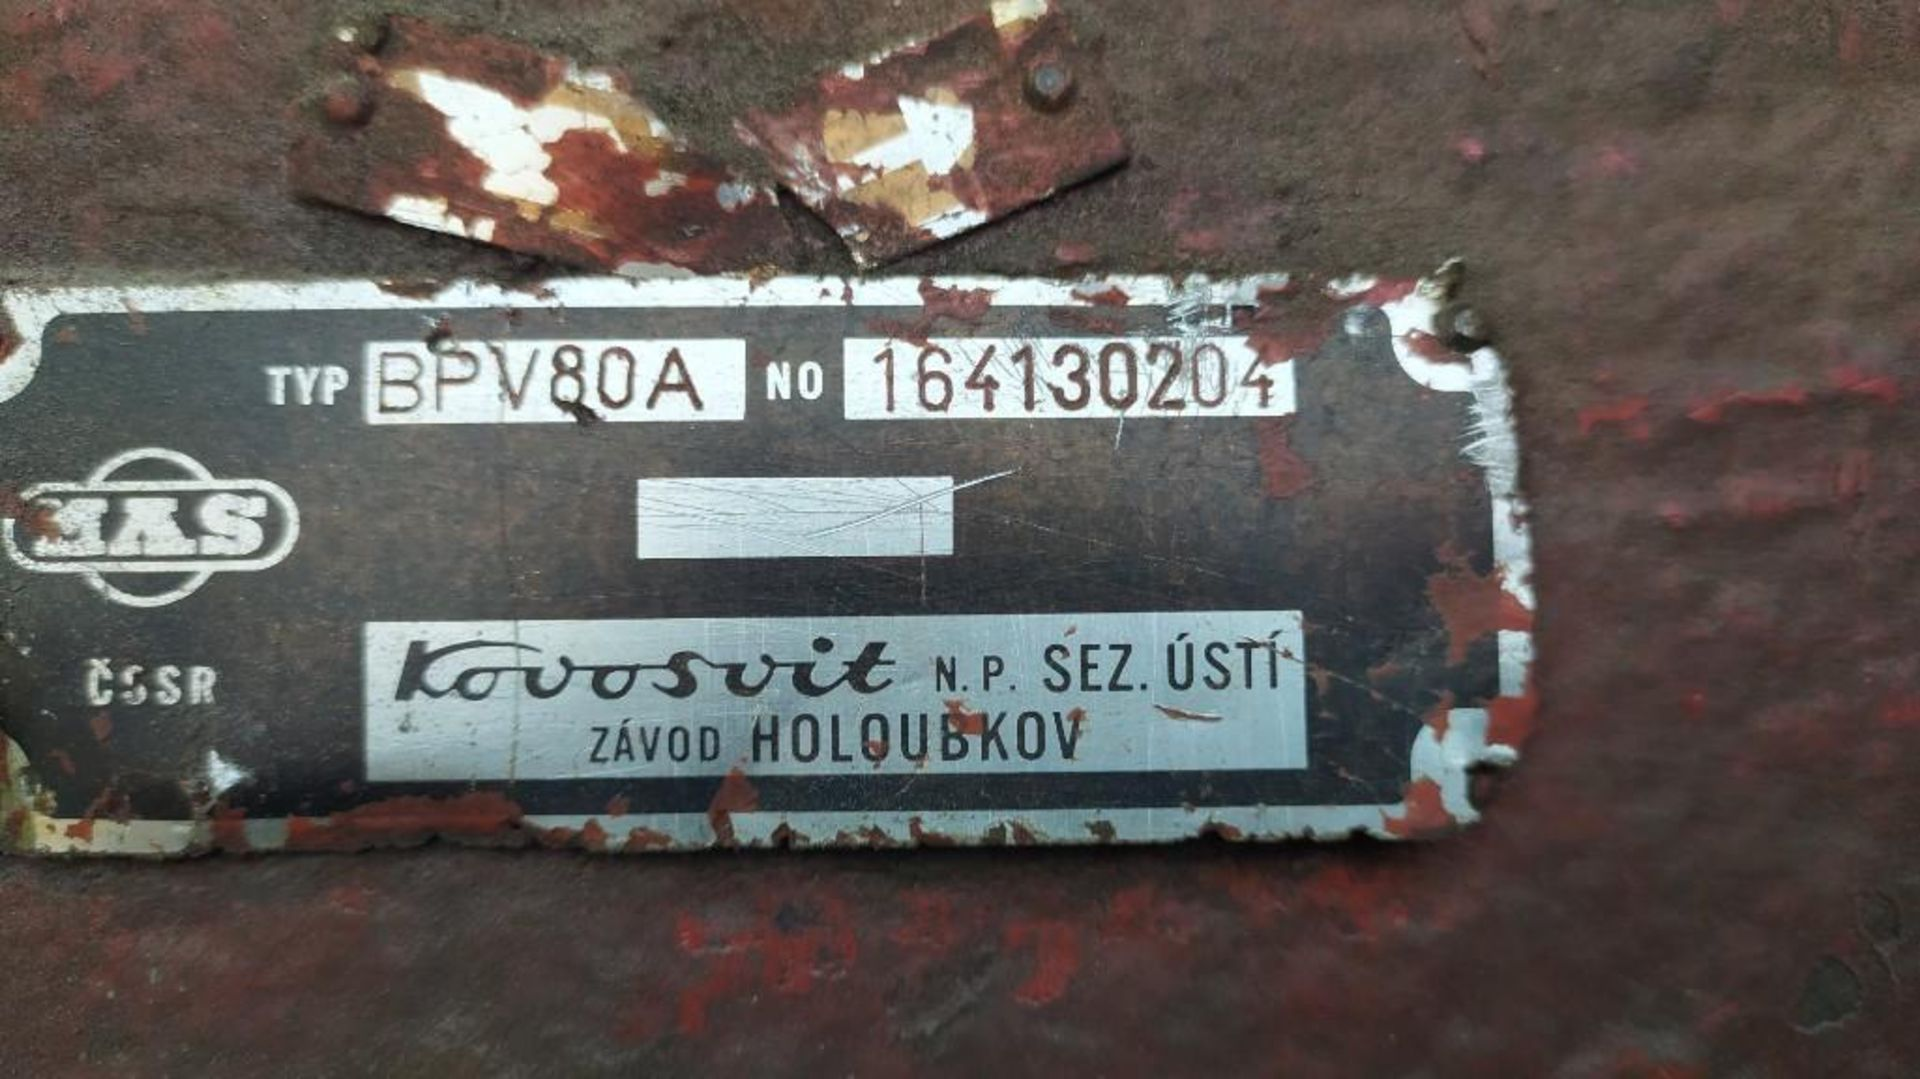 Lot 42 - KOVOSVITROTORY HEAD SURFACE GRINDER; MODEL BPV80A